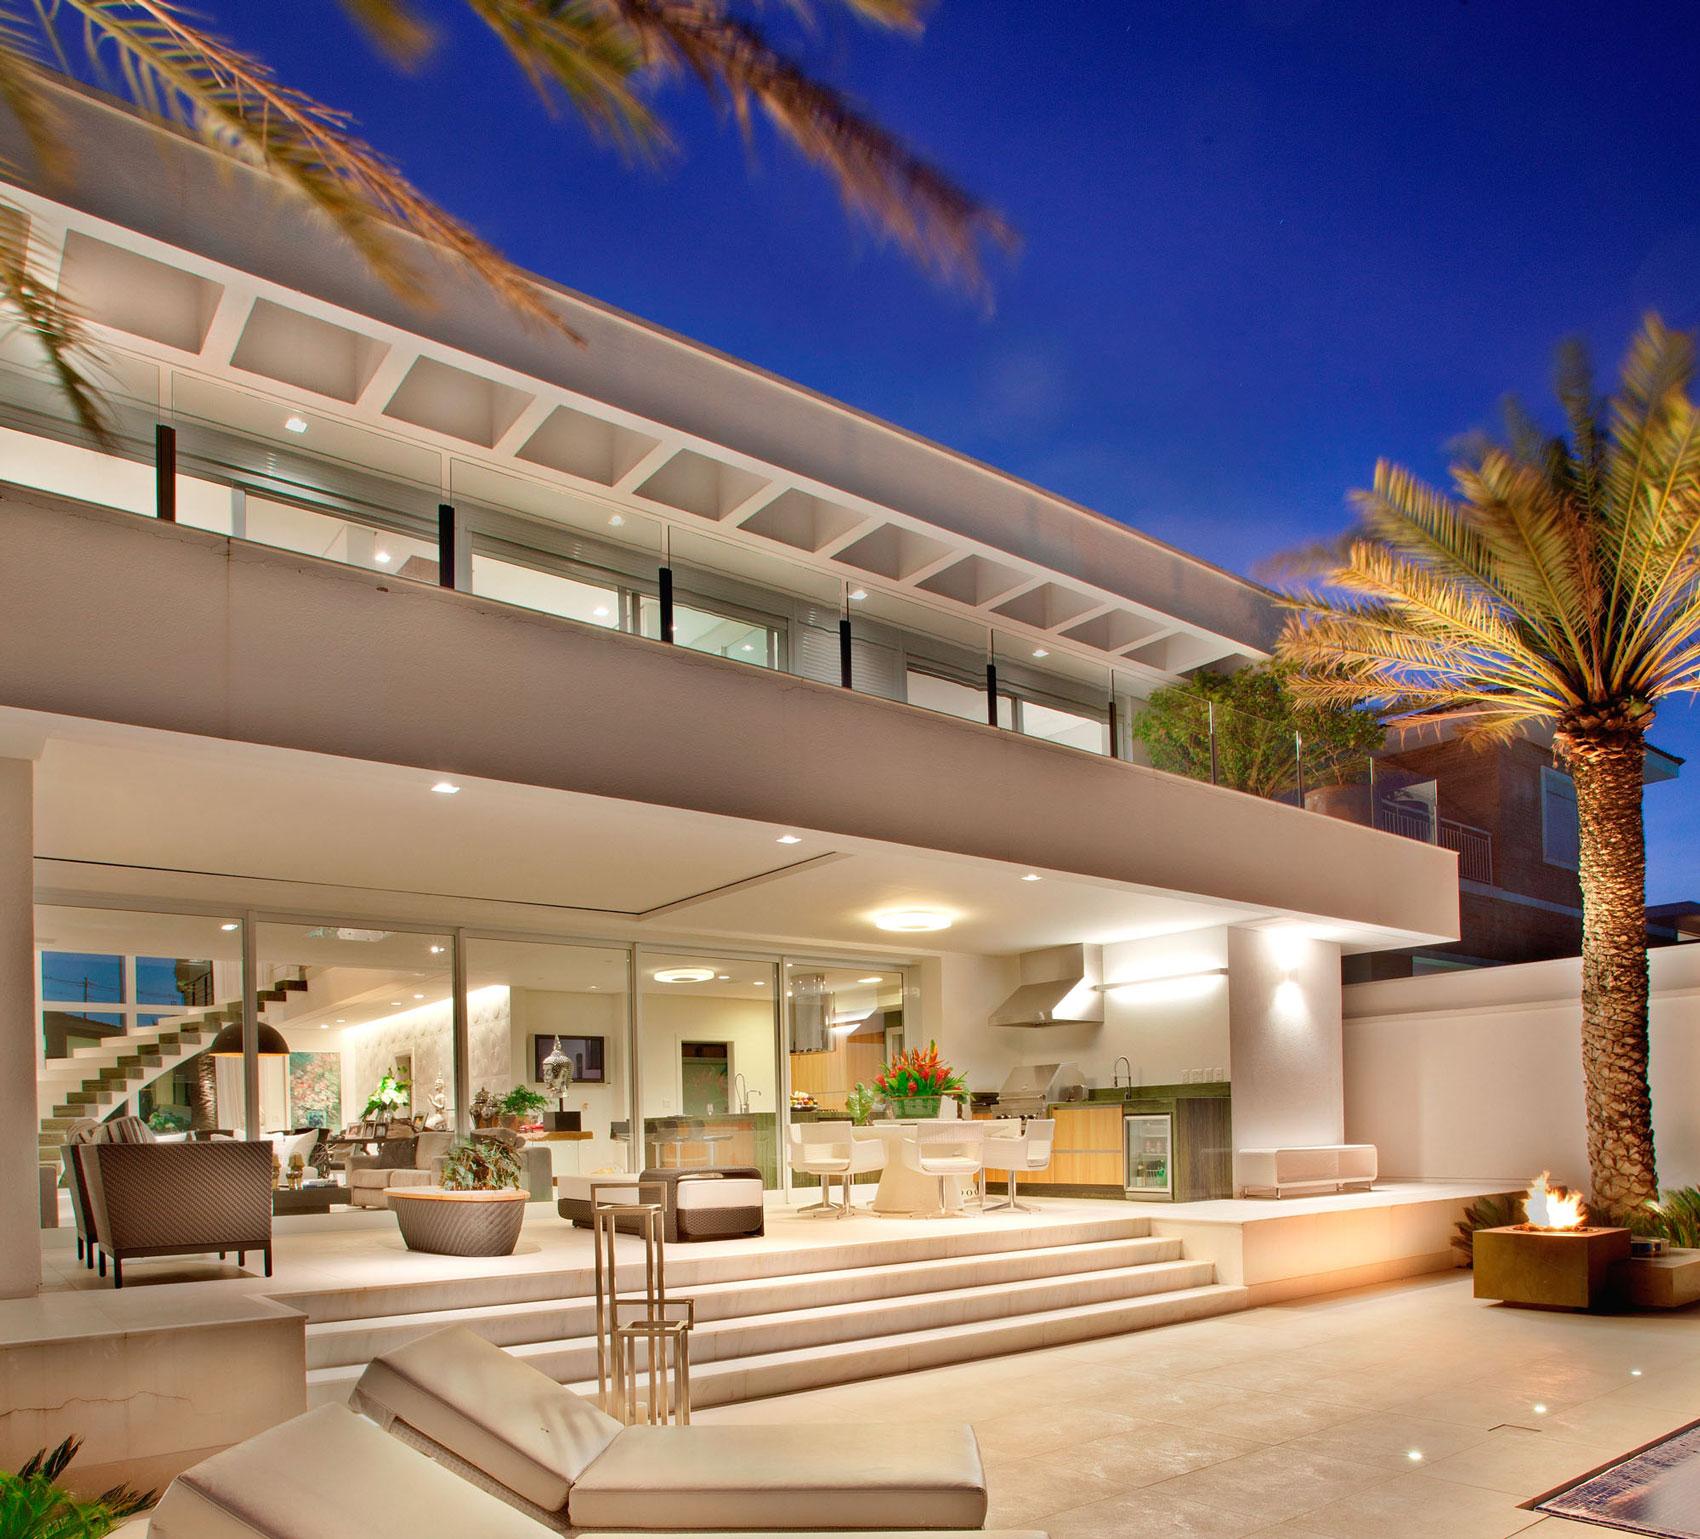 Residencia nj by pupogaspar arquitetura architecture - Sublimissime residencia nj pupogaspar arquitetura ...